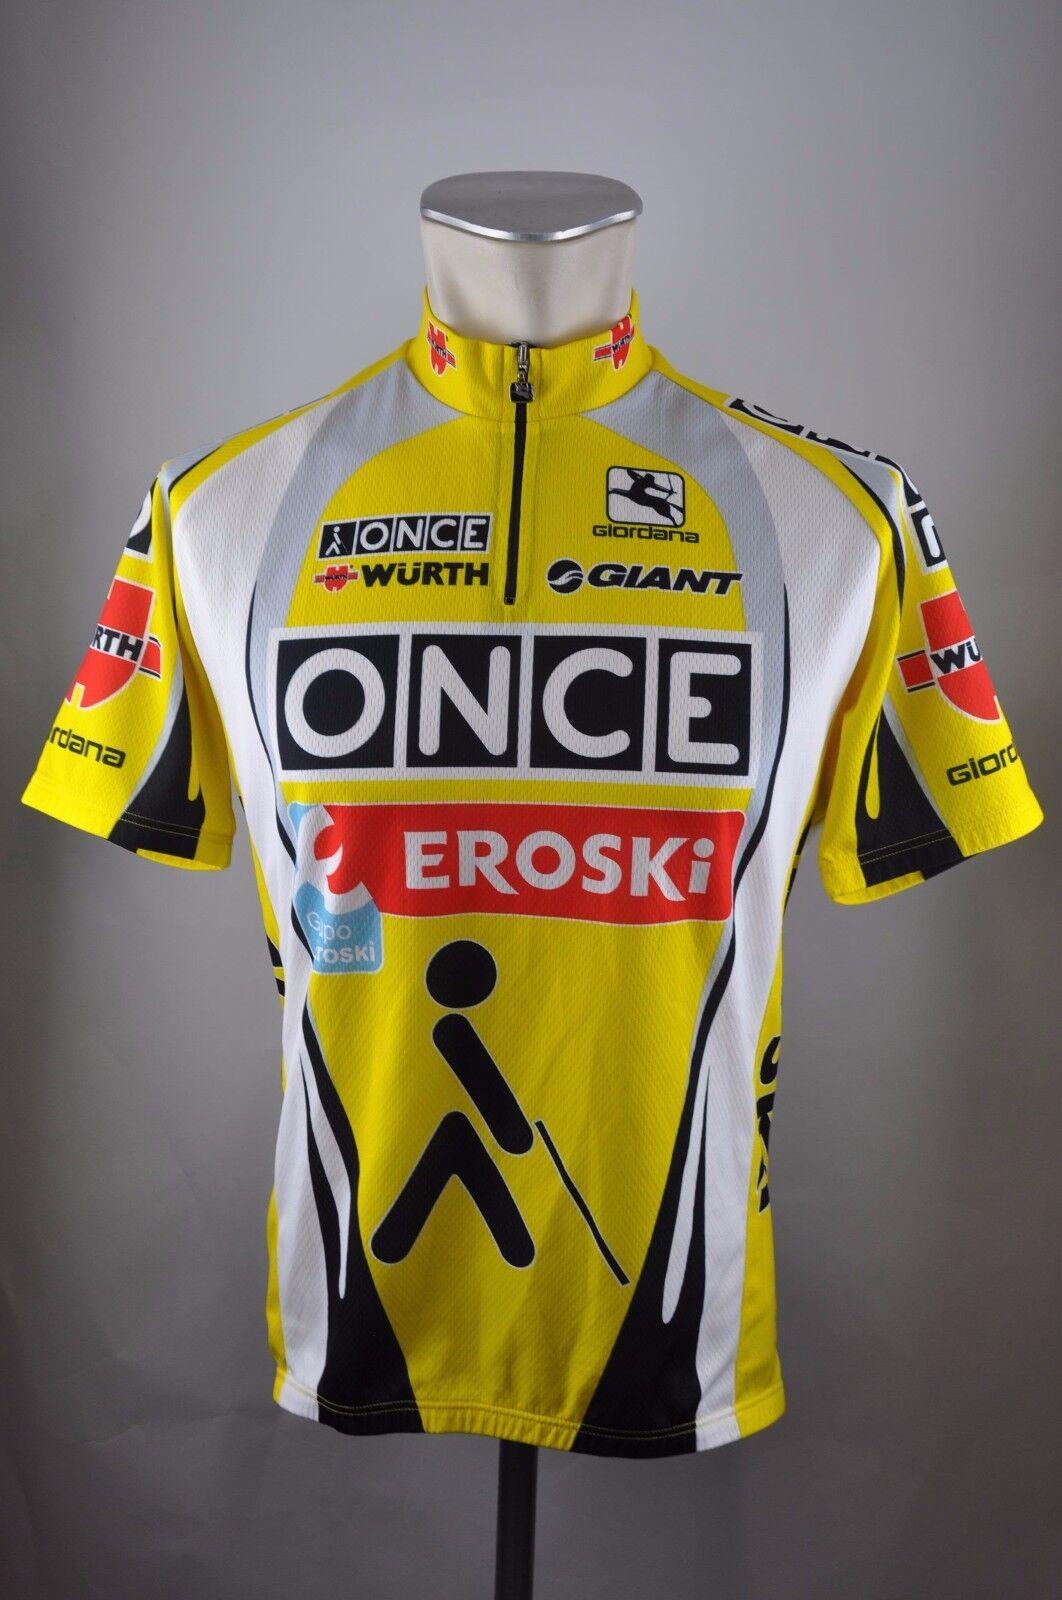 ONCE Eroski Eroski Eroski Giordana Cycle Jersey Vélo Bike Roue maillot taille XL 59 cm k1 bc0c73